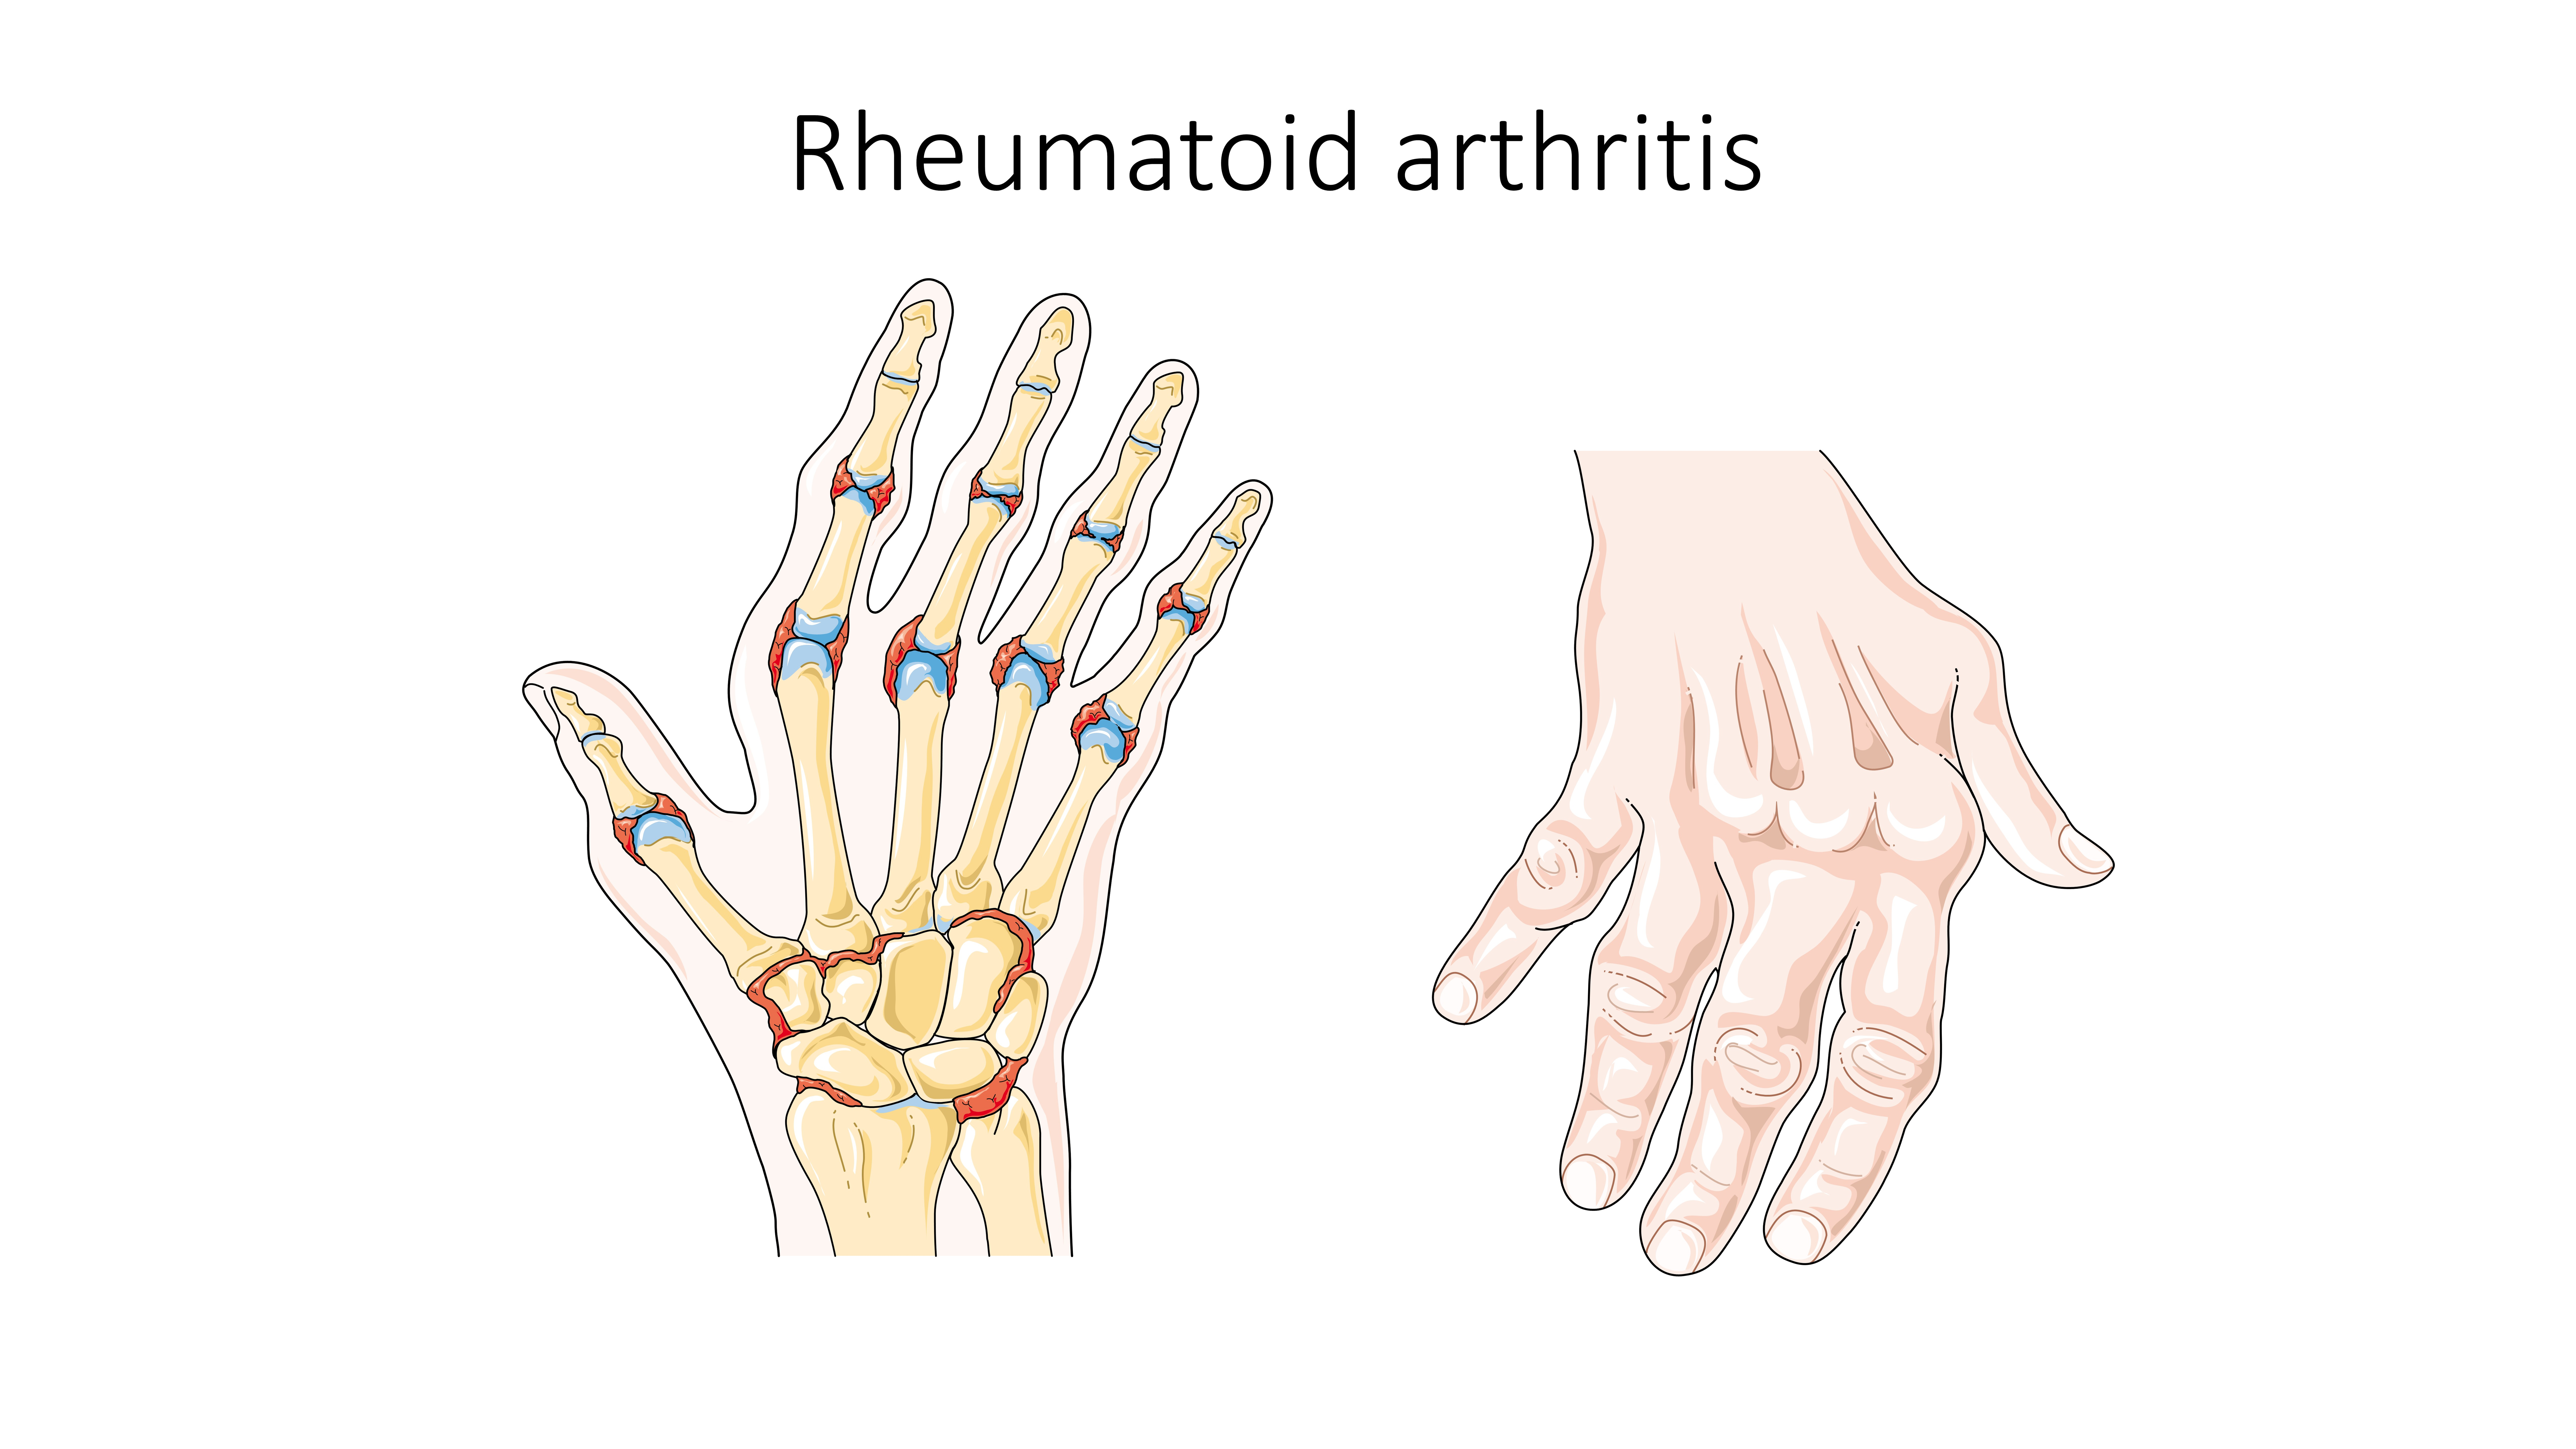 File:Rheumatoid arthritis -- Smart-Servier.jpg